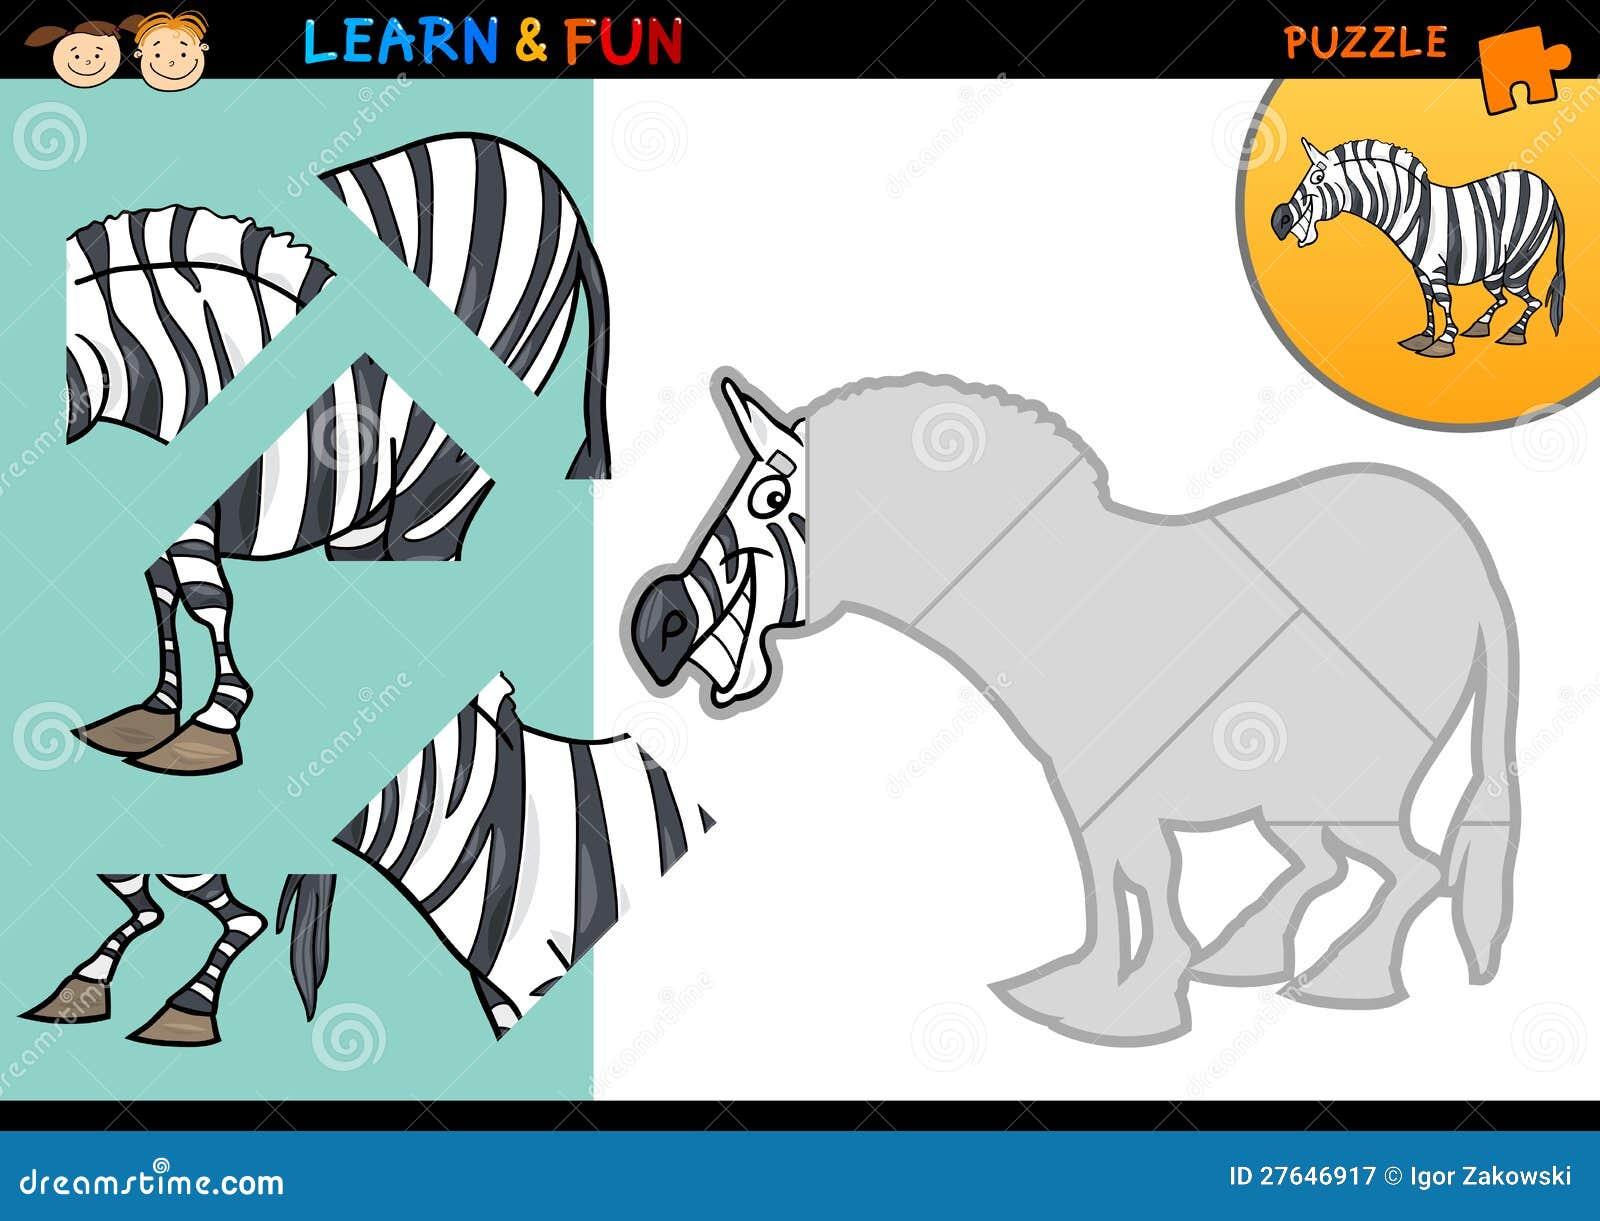 Cartoon Zebra Puzzle Game Royalty Free Stock Photography - Image ...